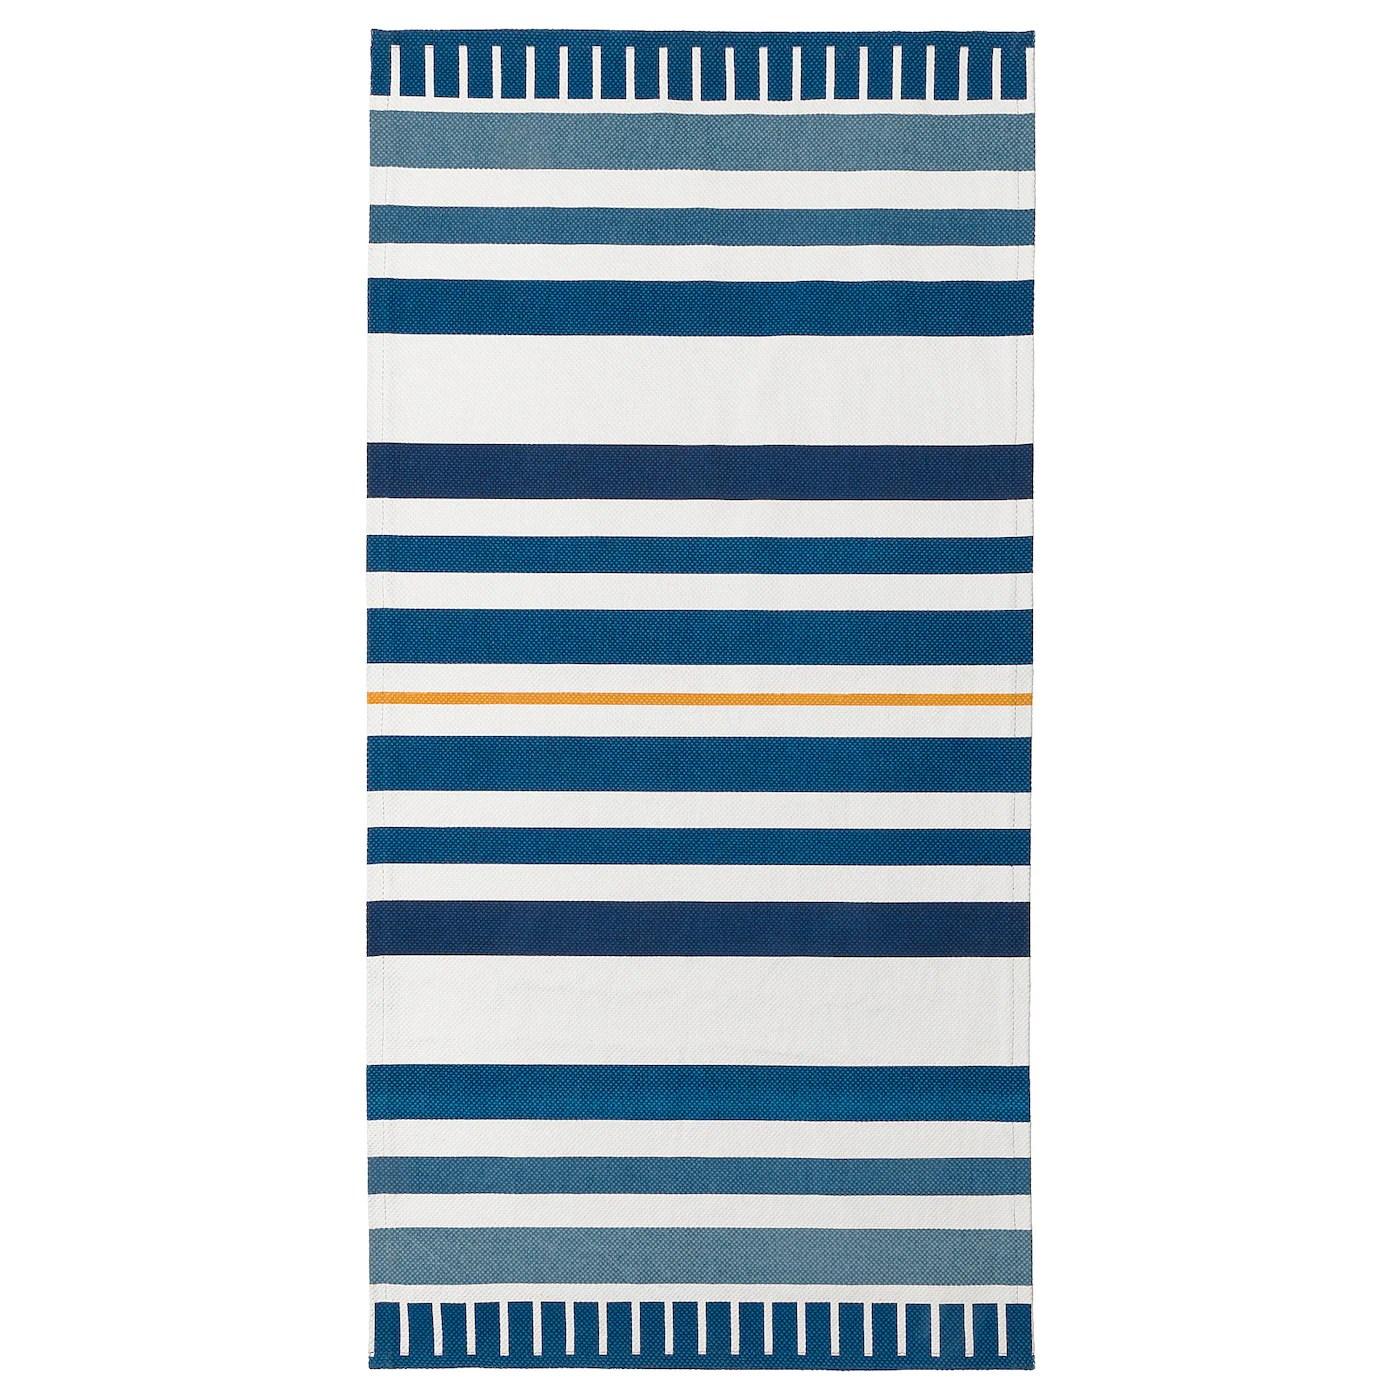 sanglarka tapis tisse a plat bleu fonce 80x160 cm